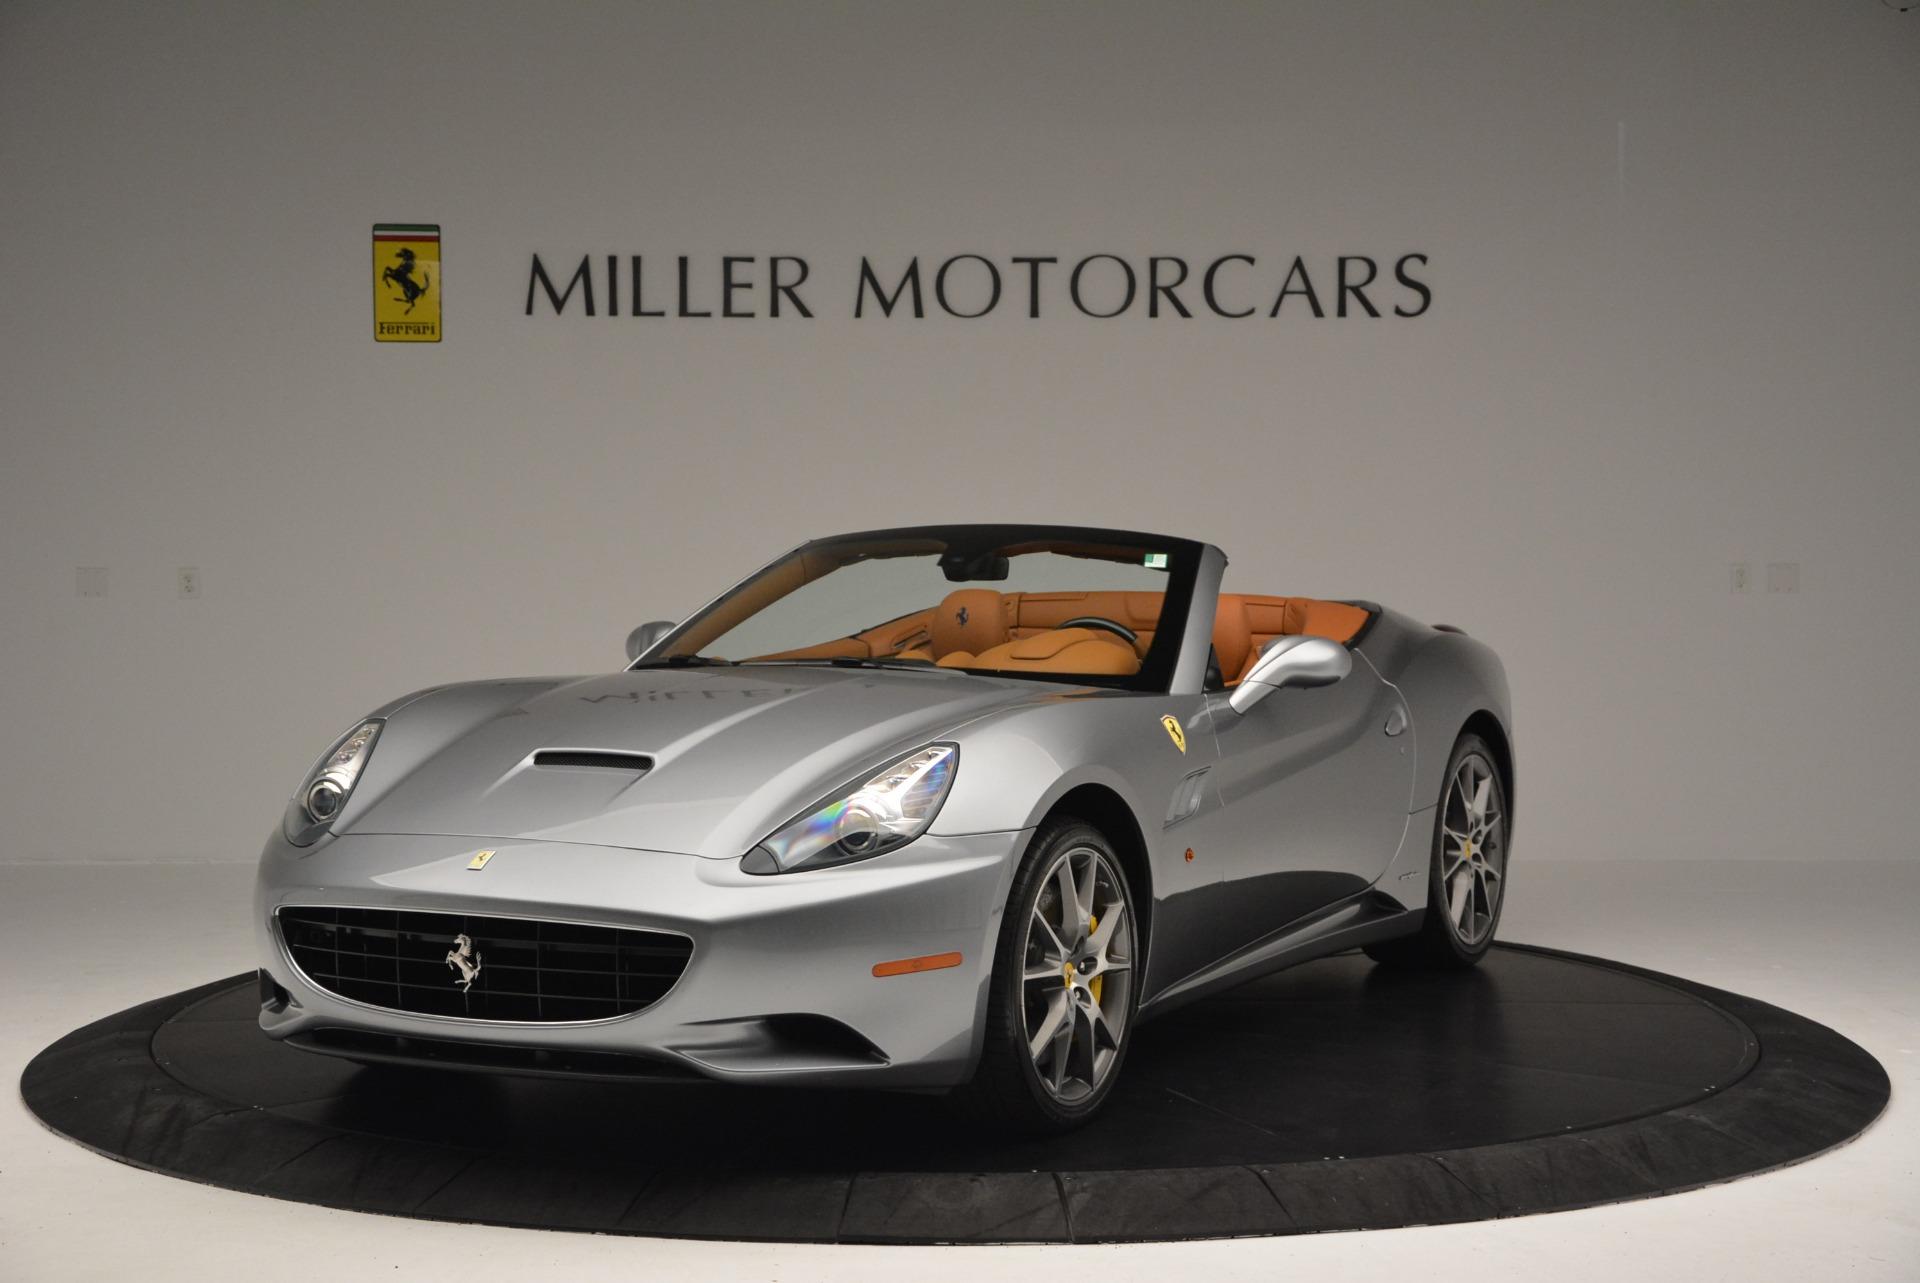 Used 2012 Ferrari California for sale Sold at Pagani of Greenwich in Greenwich CT 06830 1